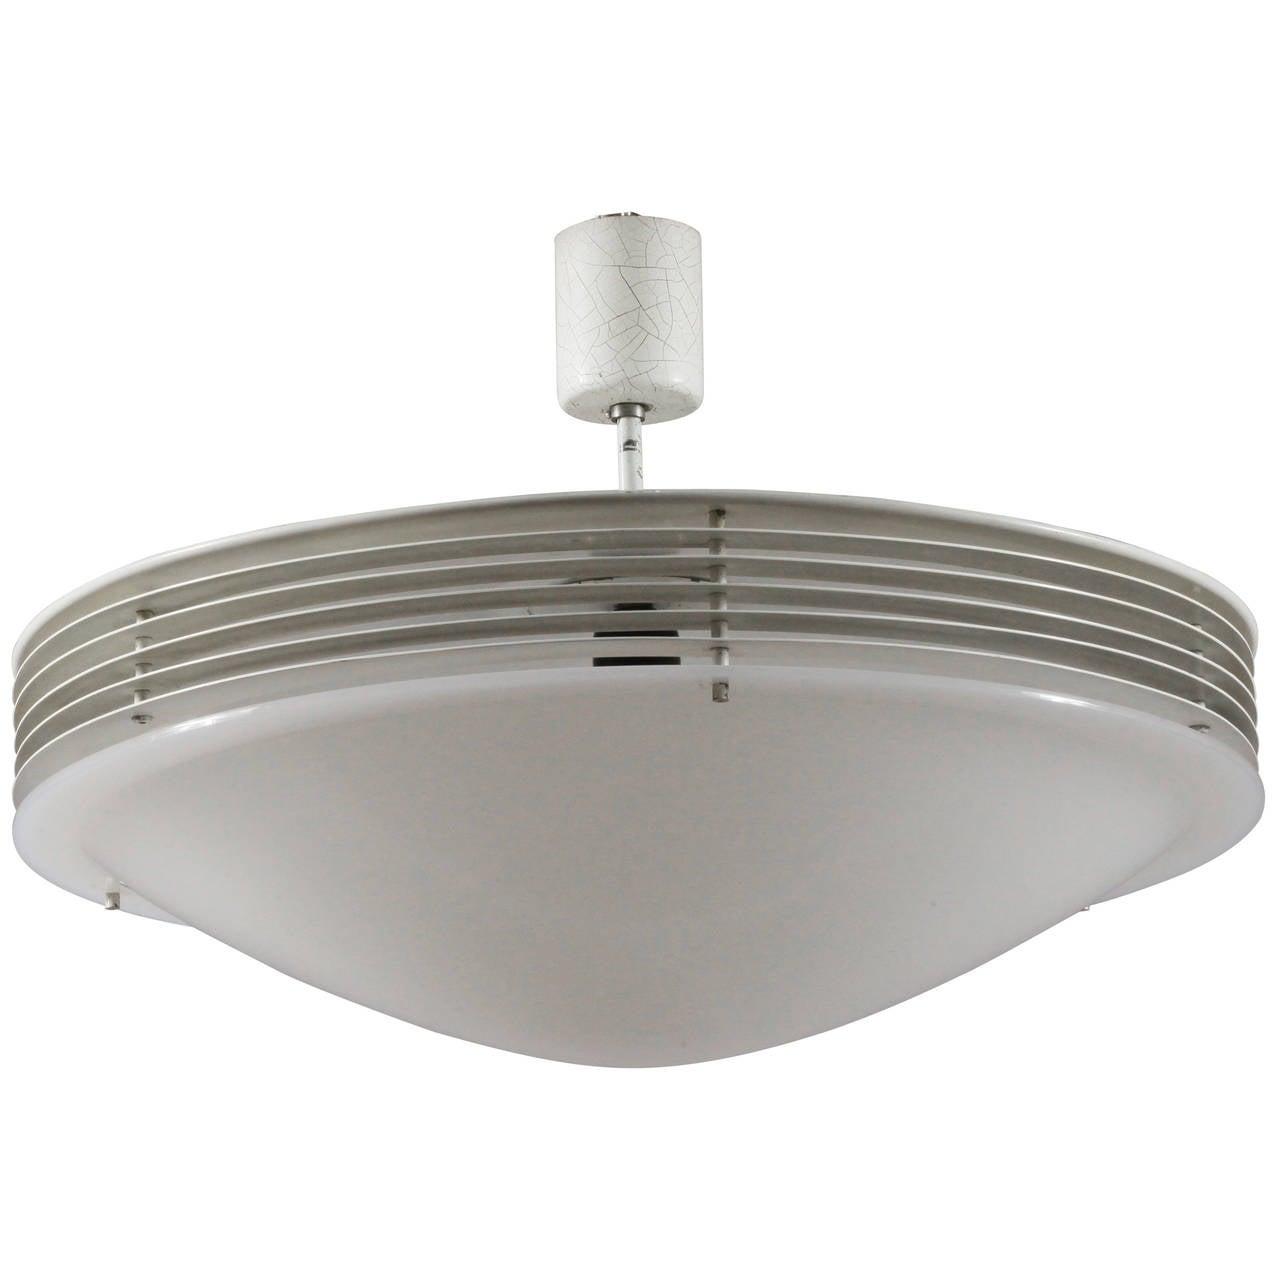 Amazing Diffusion Ceiling Lamp Designed Stilnovo, Italy, 1960